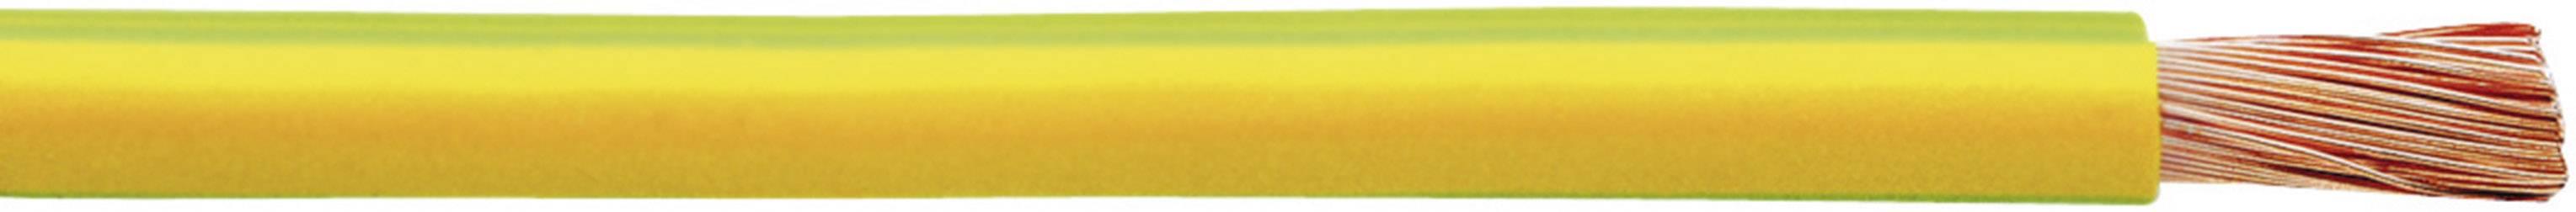 Opletenie / lanko Faber Kabel 040063 H07V-K, 1 x 35 mm², vonkajší Ø 9.80 mm, metrový tovar, čierna